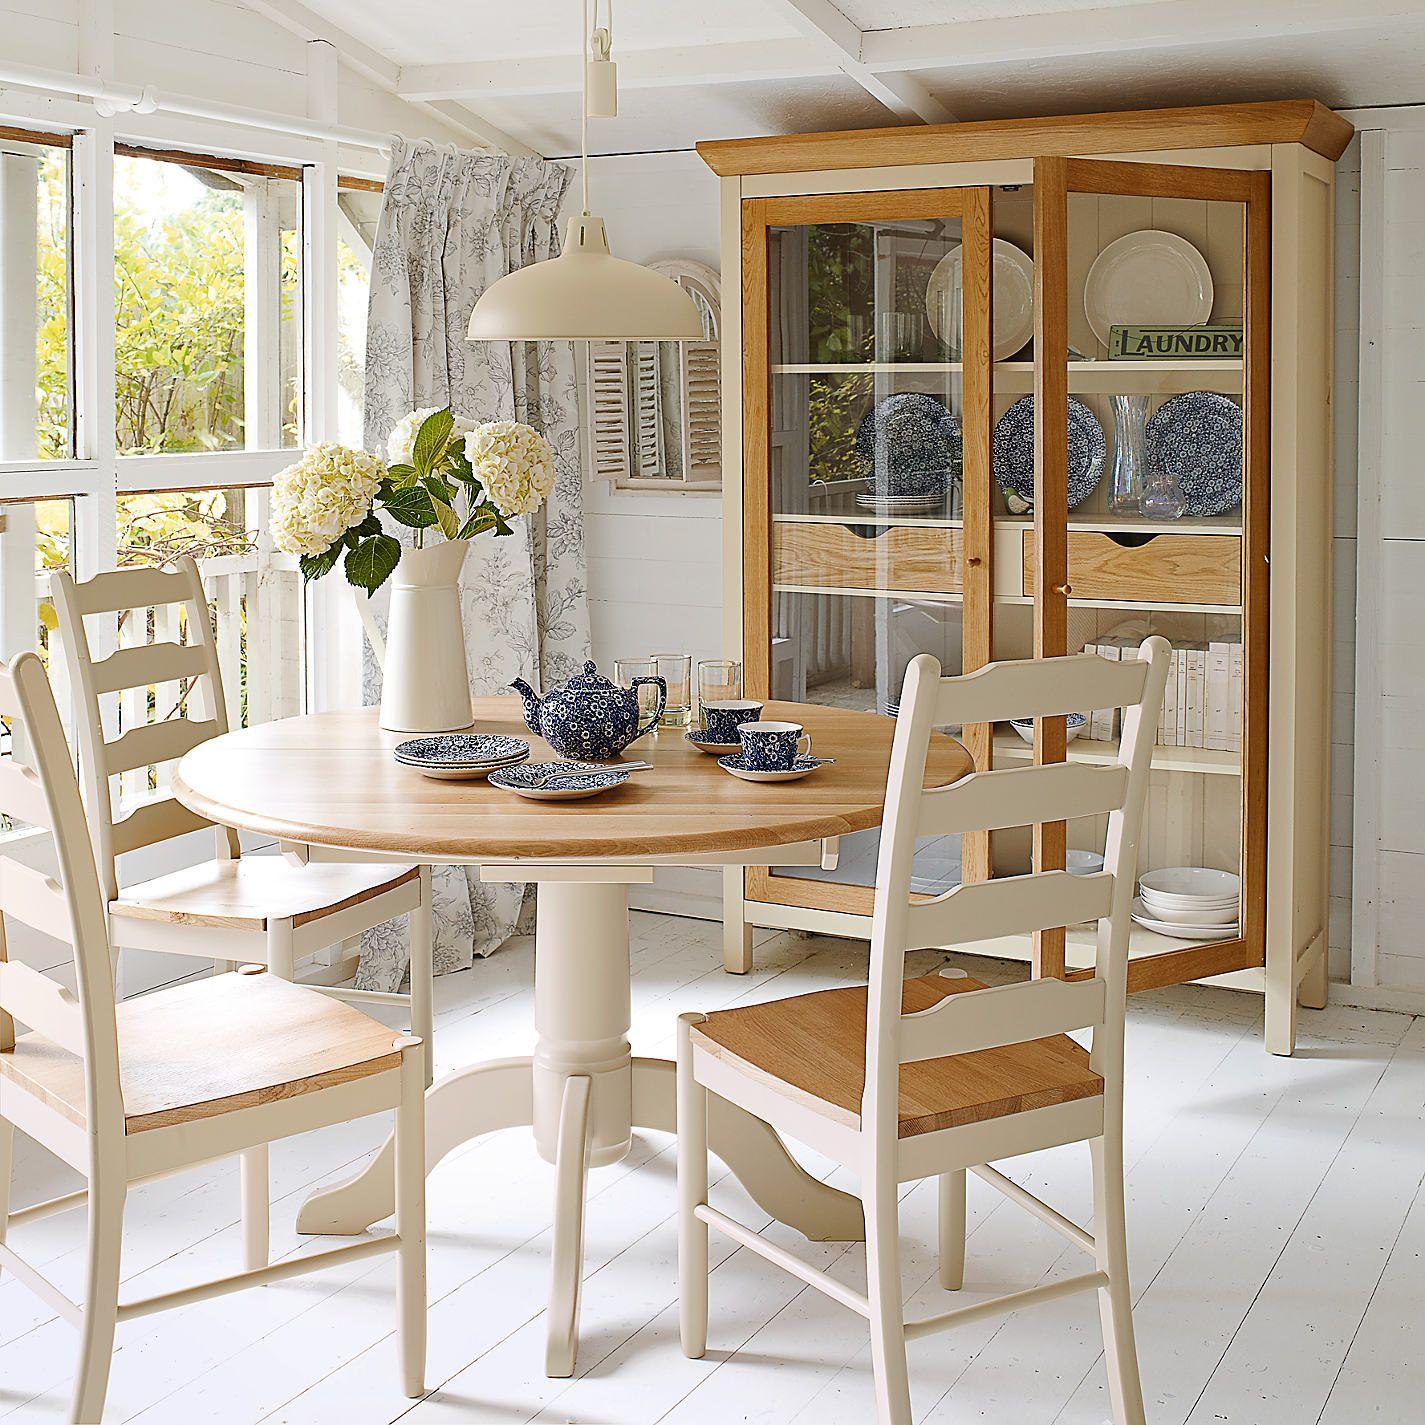 Buy John Lewis Regent Dining Room Furniture Range online at John ...